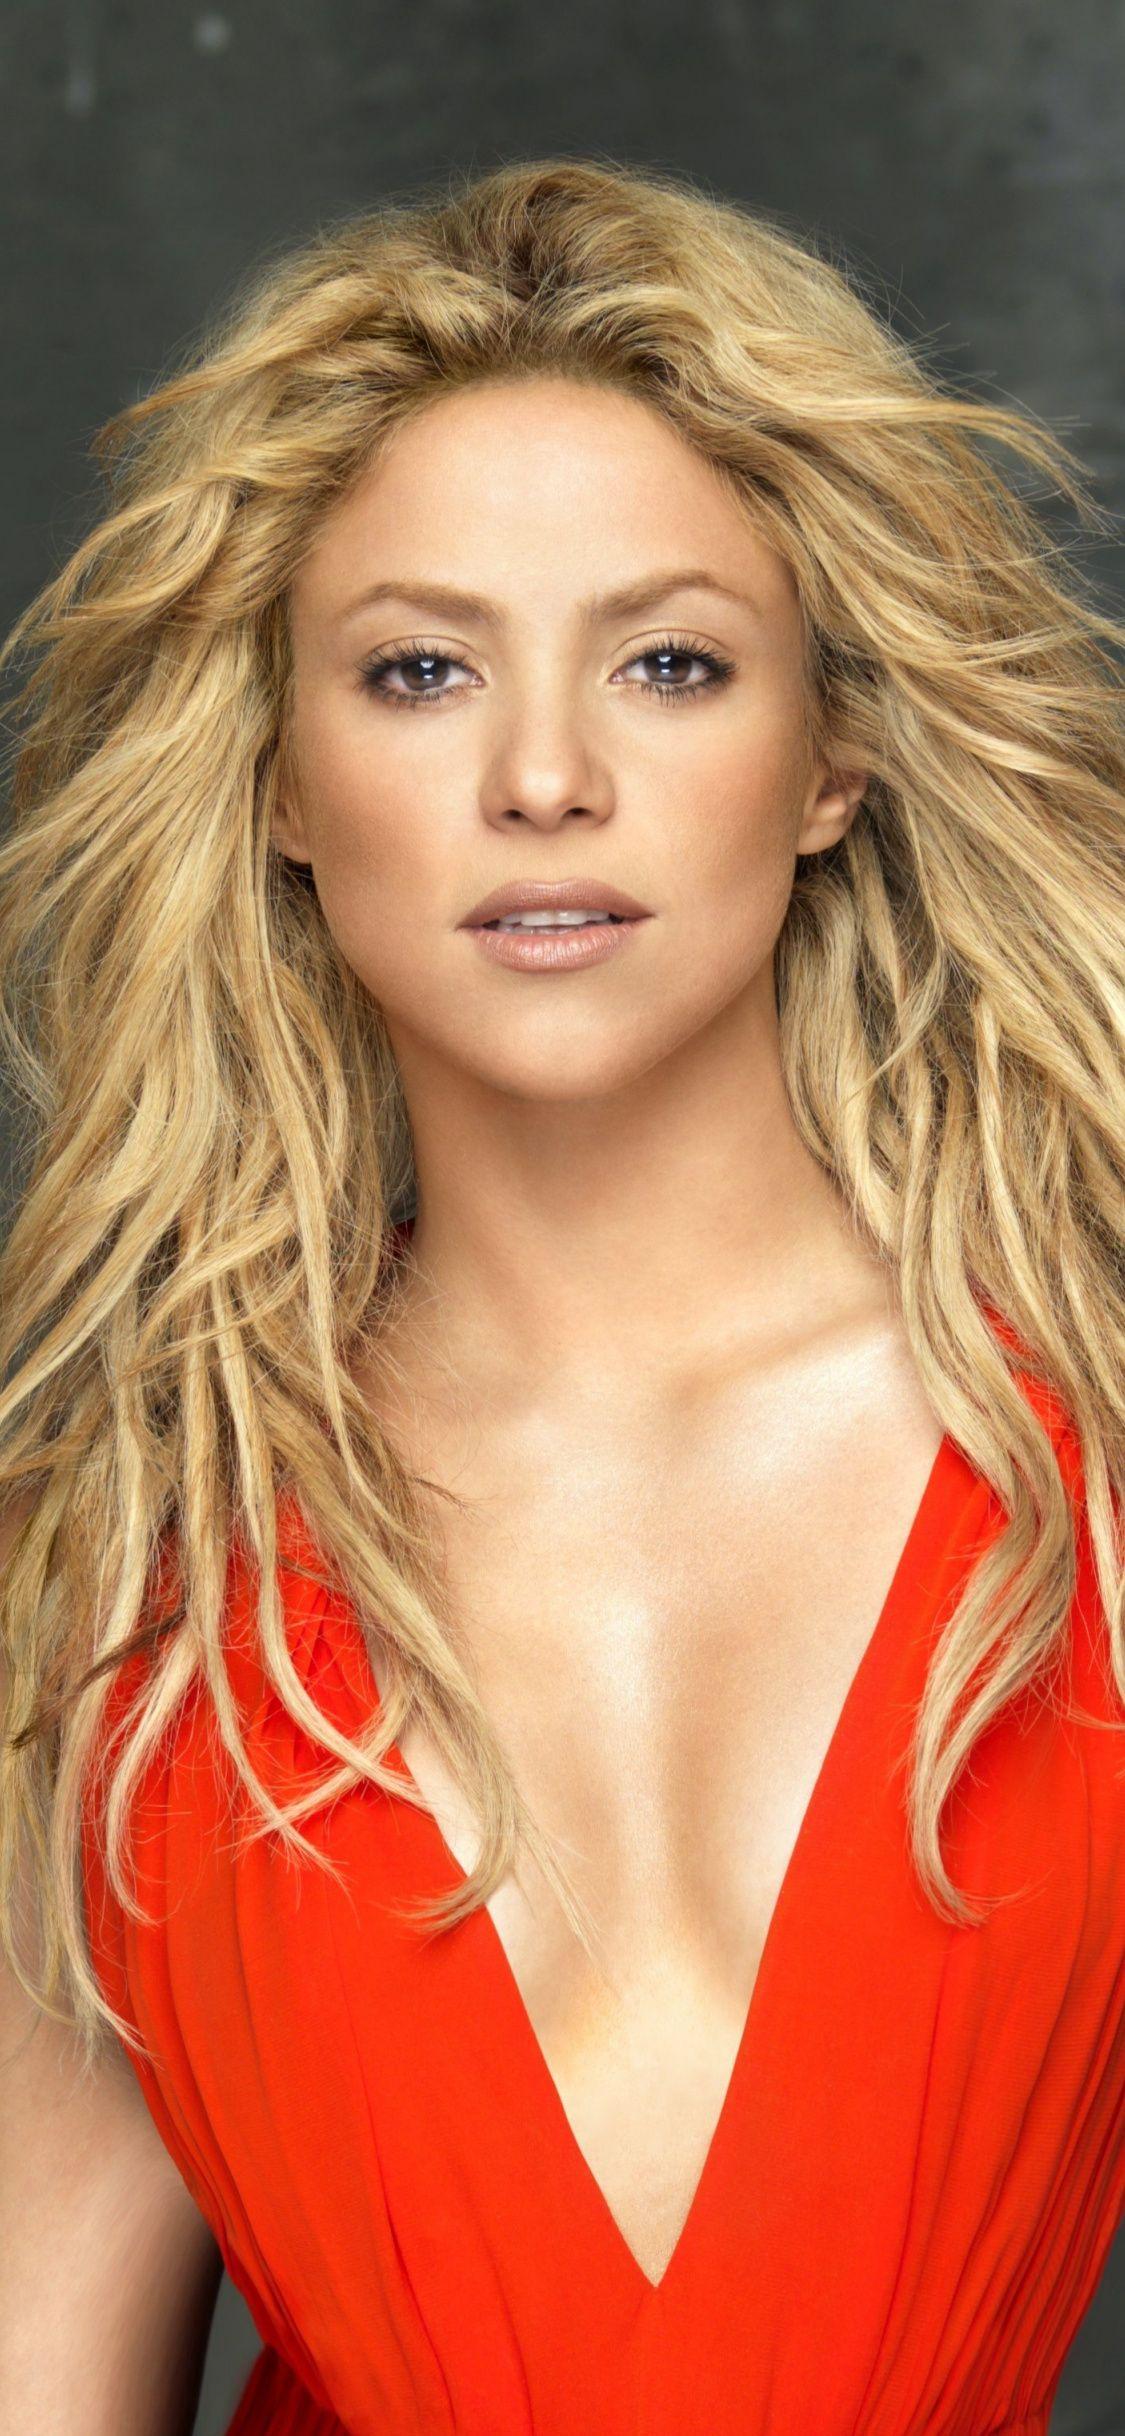 Shakira Blonde Singer Red Dress 1125x2436 Wallpaper Shakira Celebrities Celebrity Wallpapers